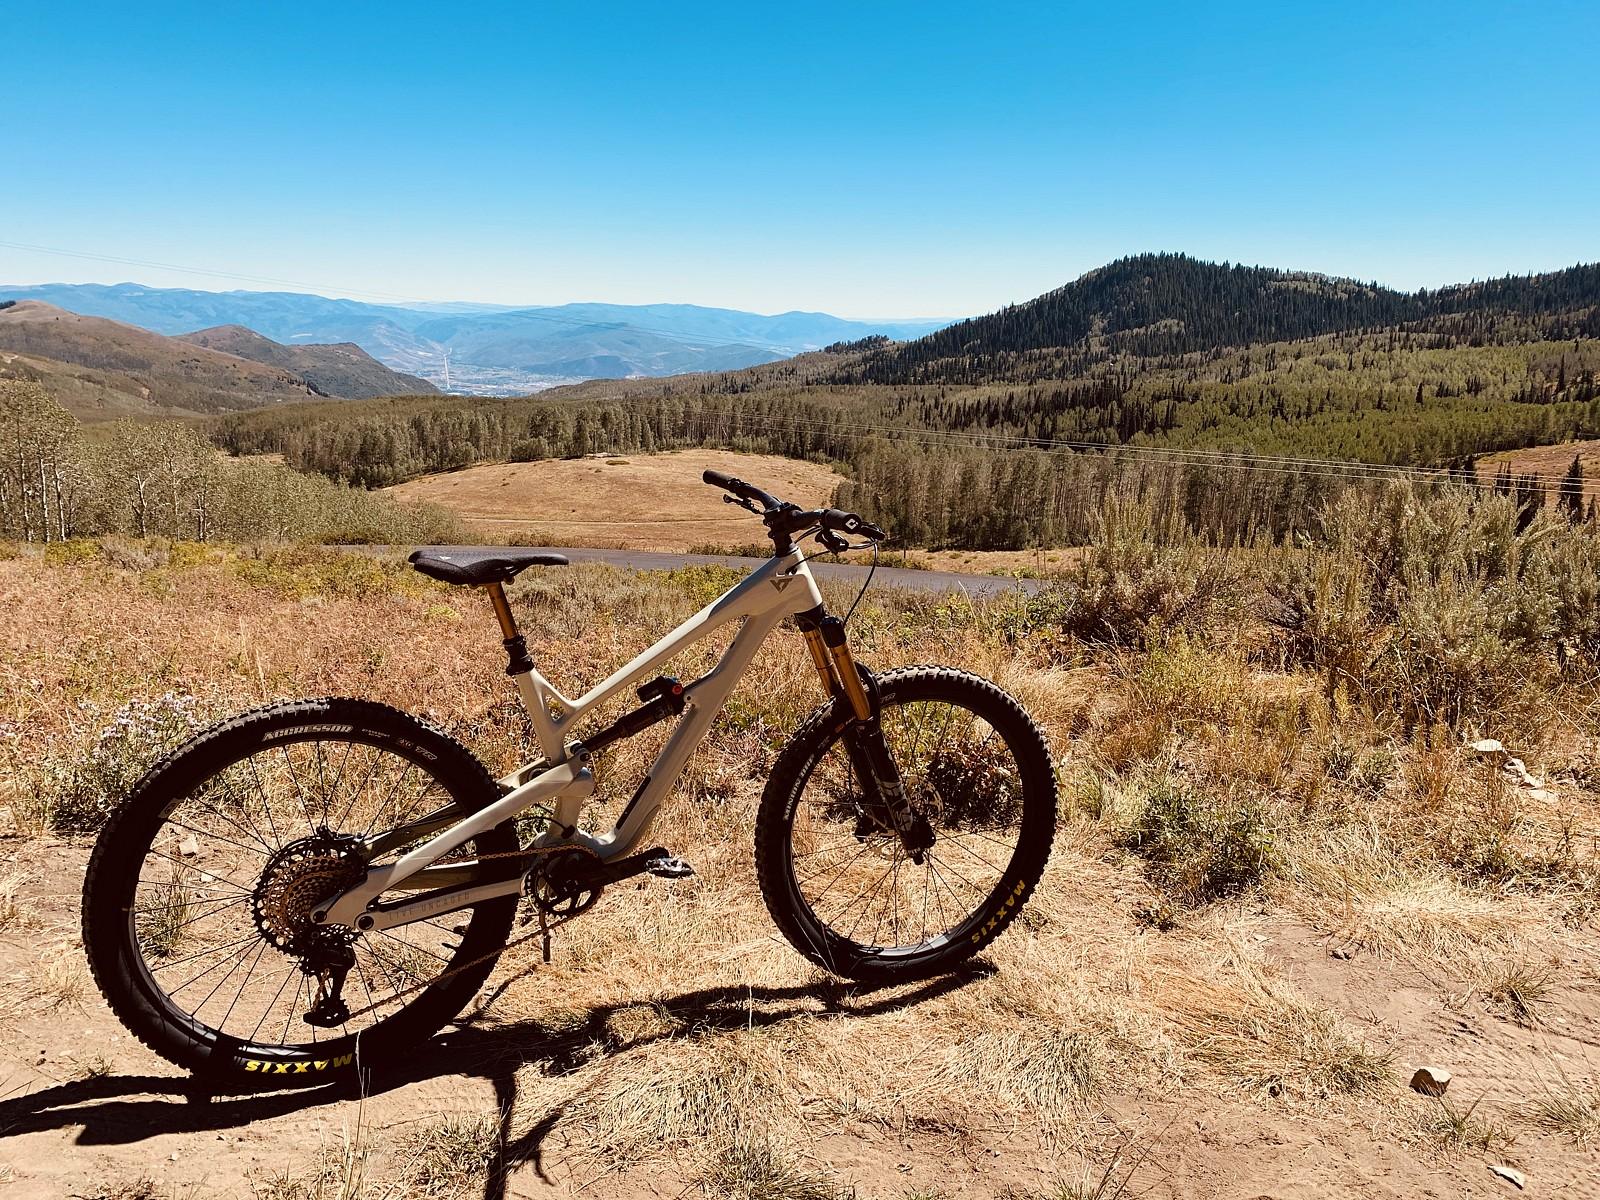 IMG E0203 - jaykalafatis - Mountain Biking Pictures - Vital MTB